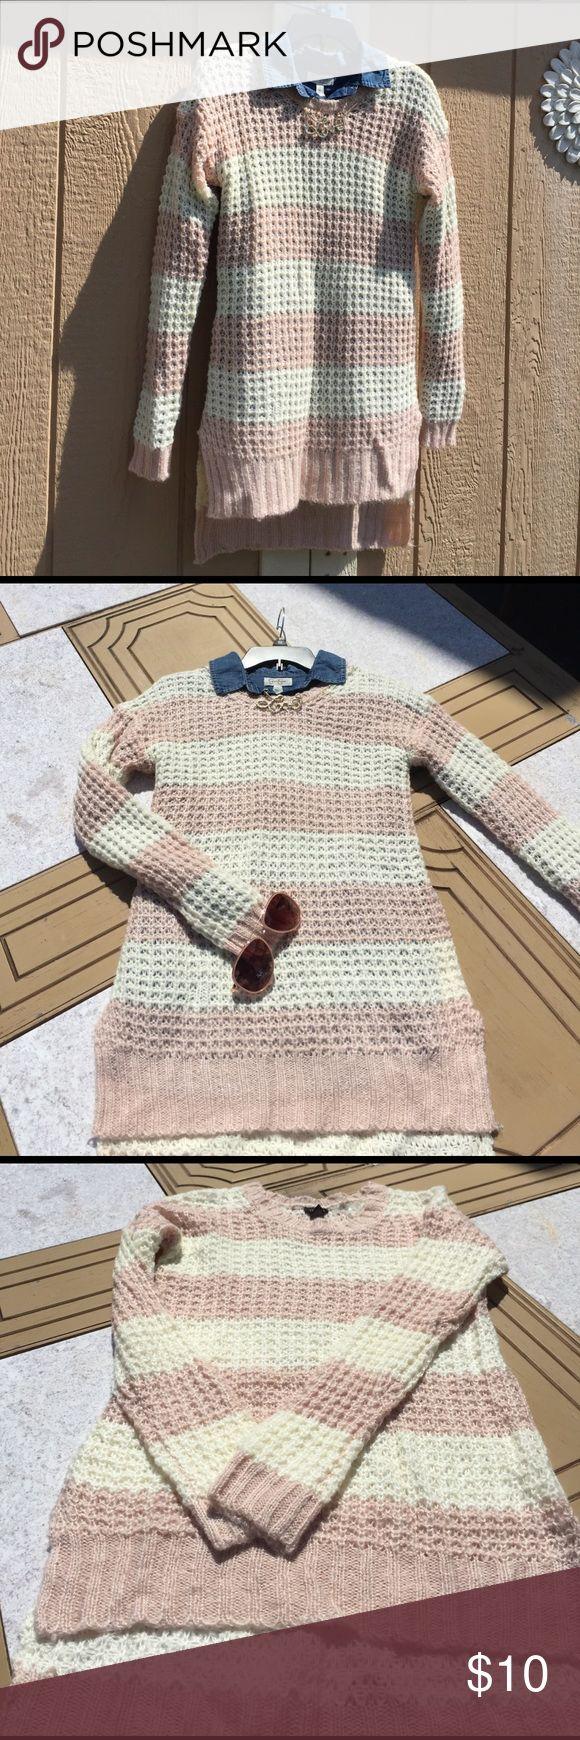 Medium rue21 sweater   Sweaters, Clothes design, Fashion